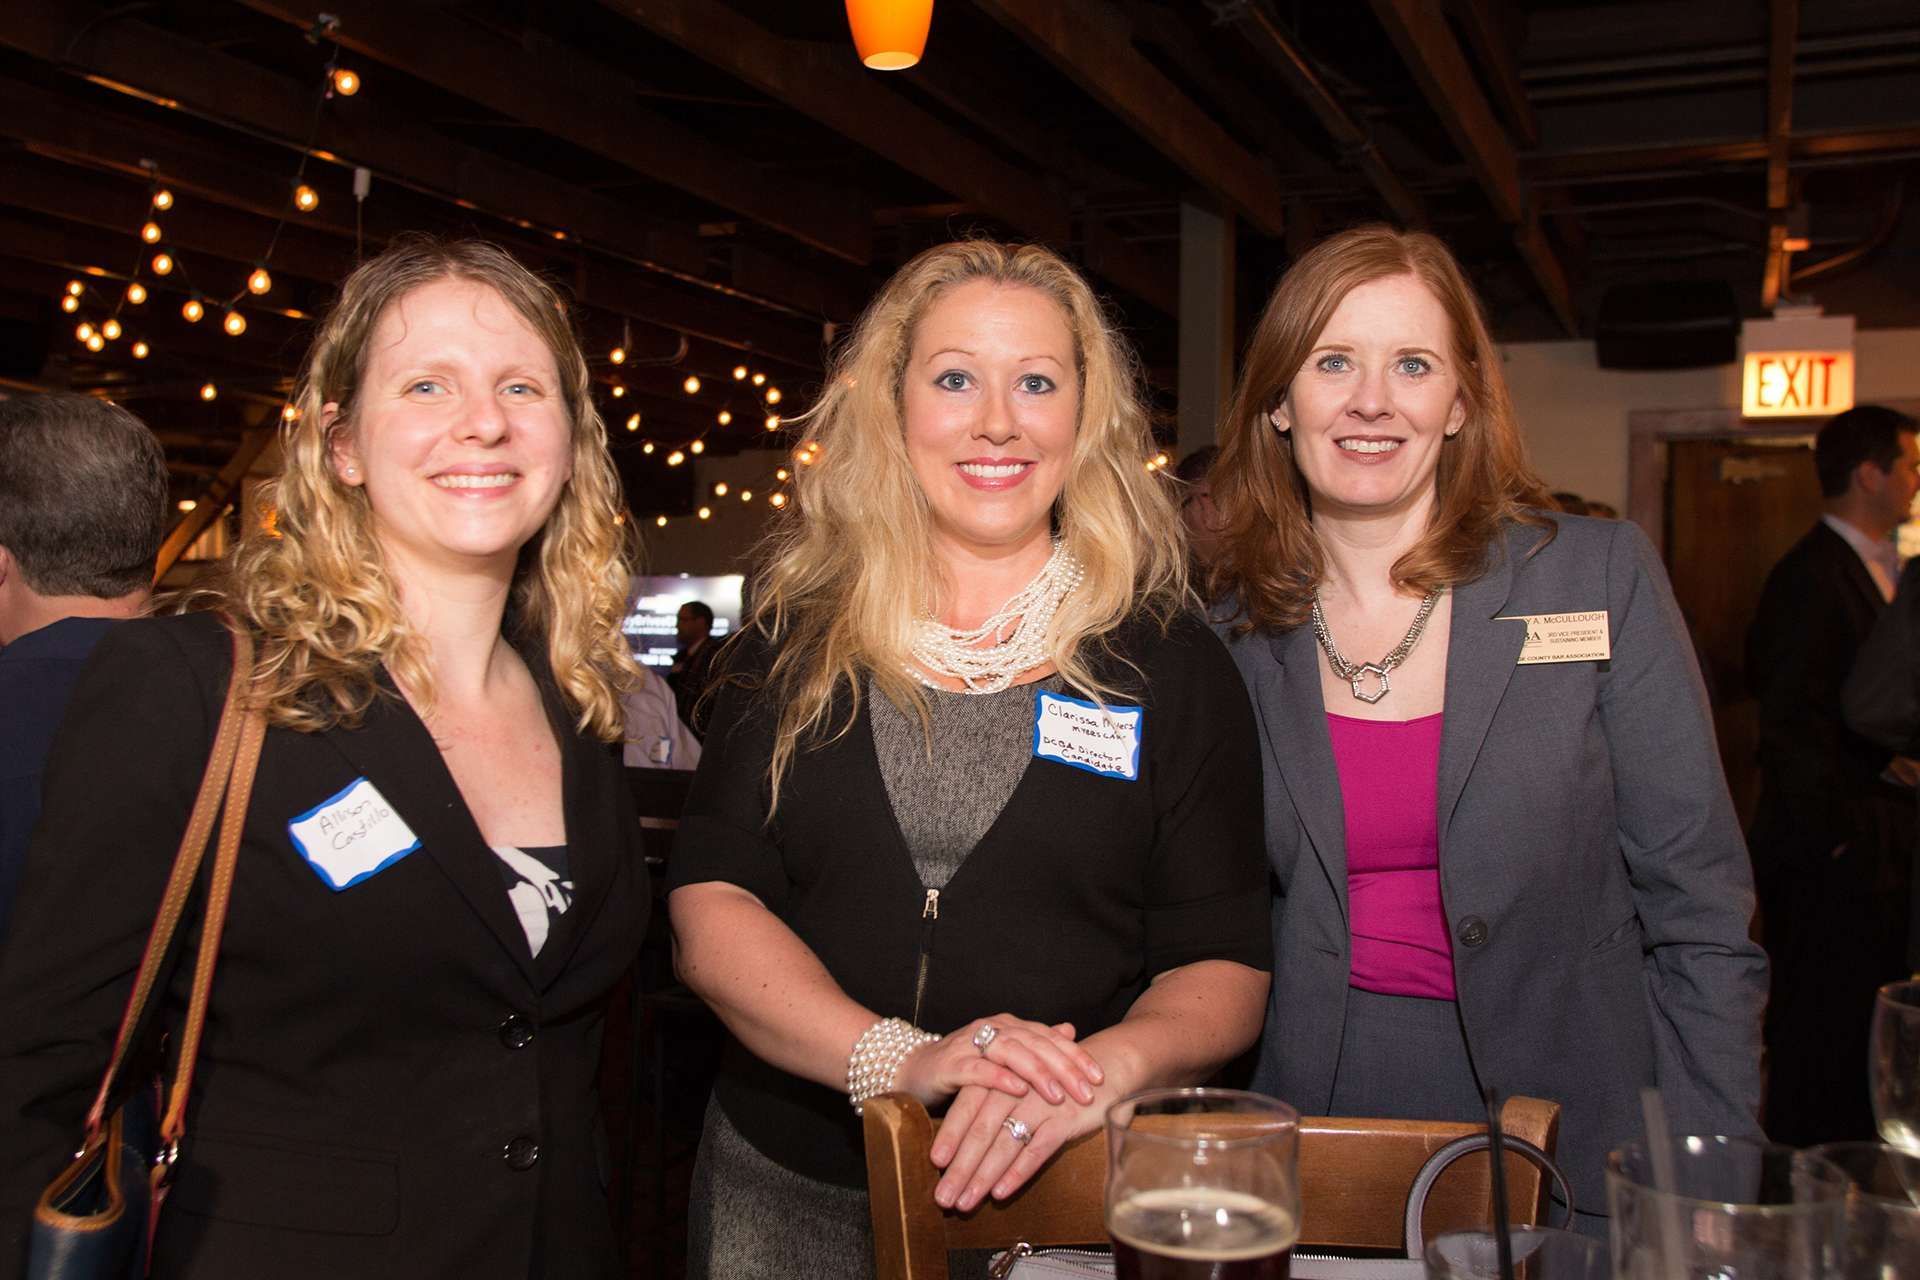 Chicago Corporate Event Photography Event Photos Illinois